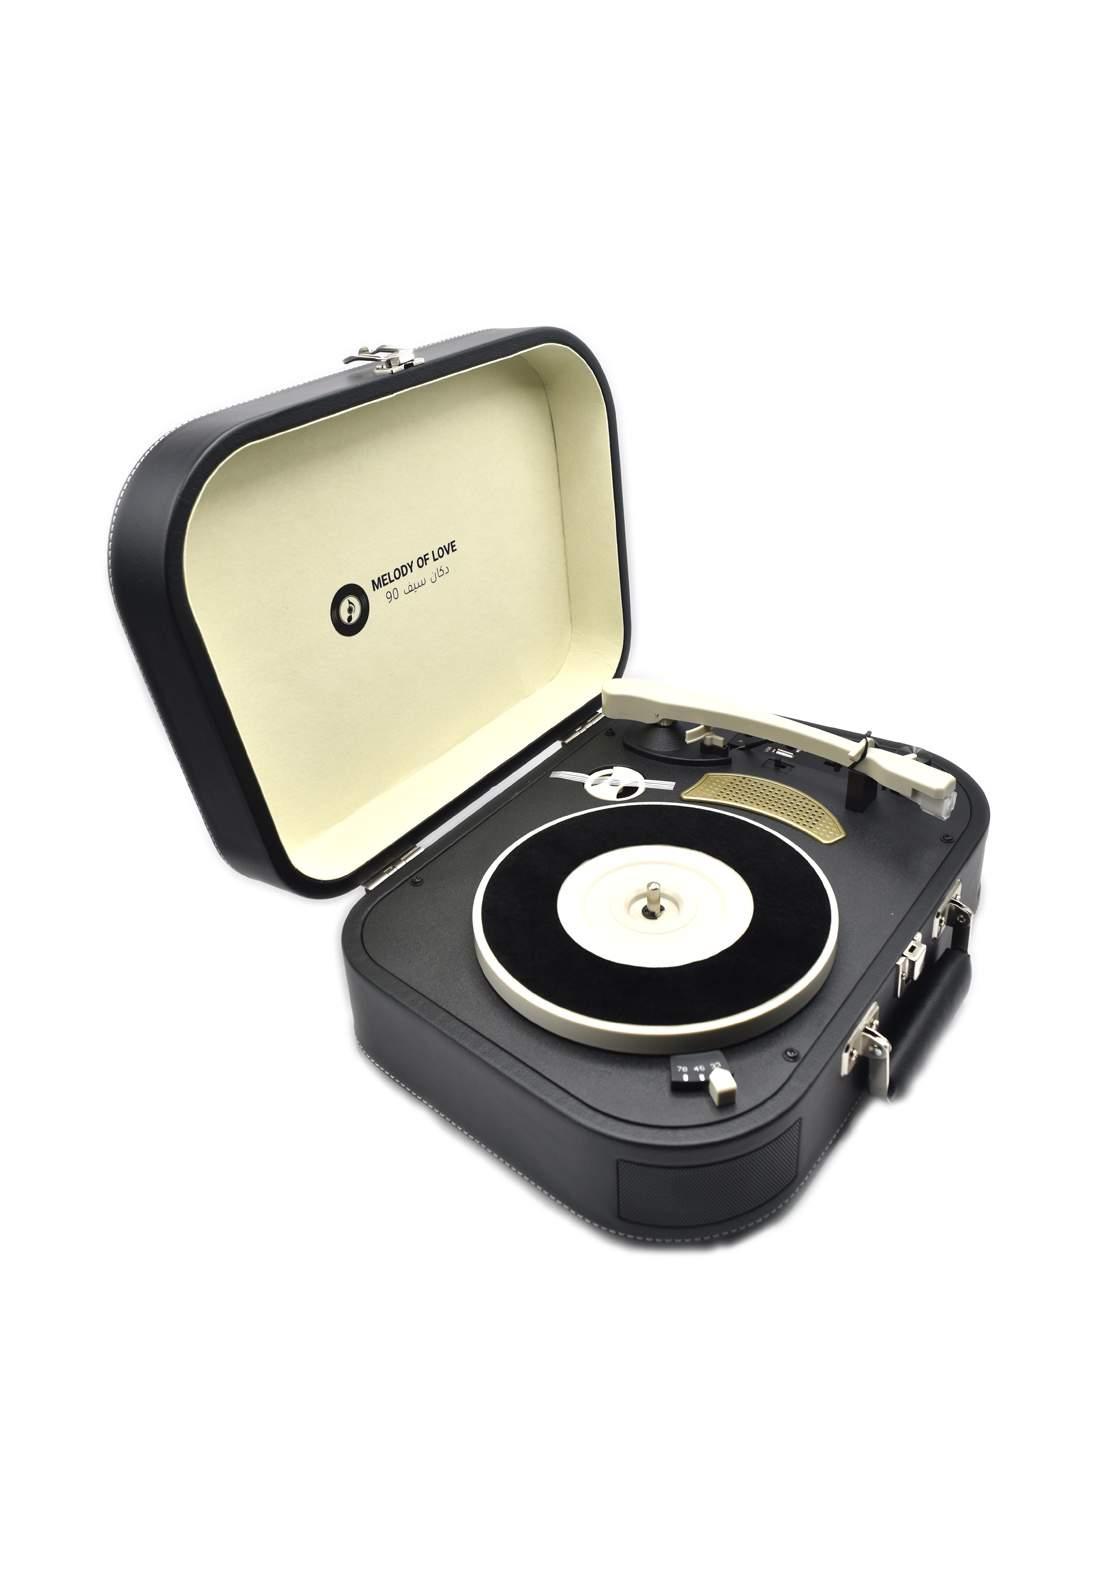 Retro Vinyl Player - Black